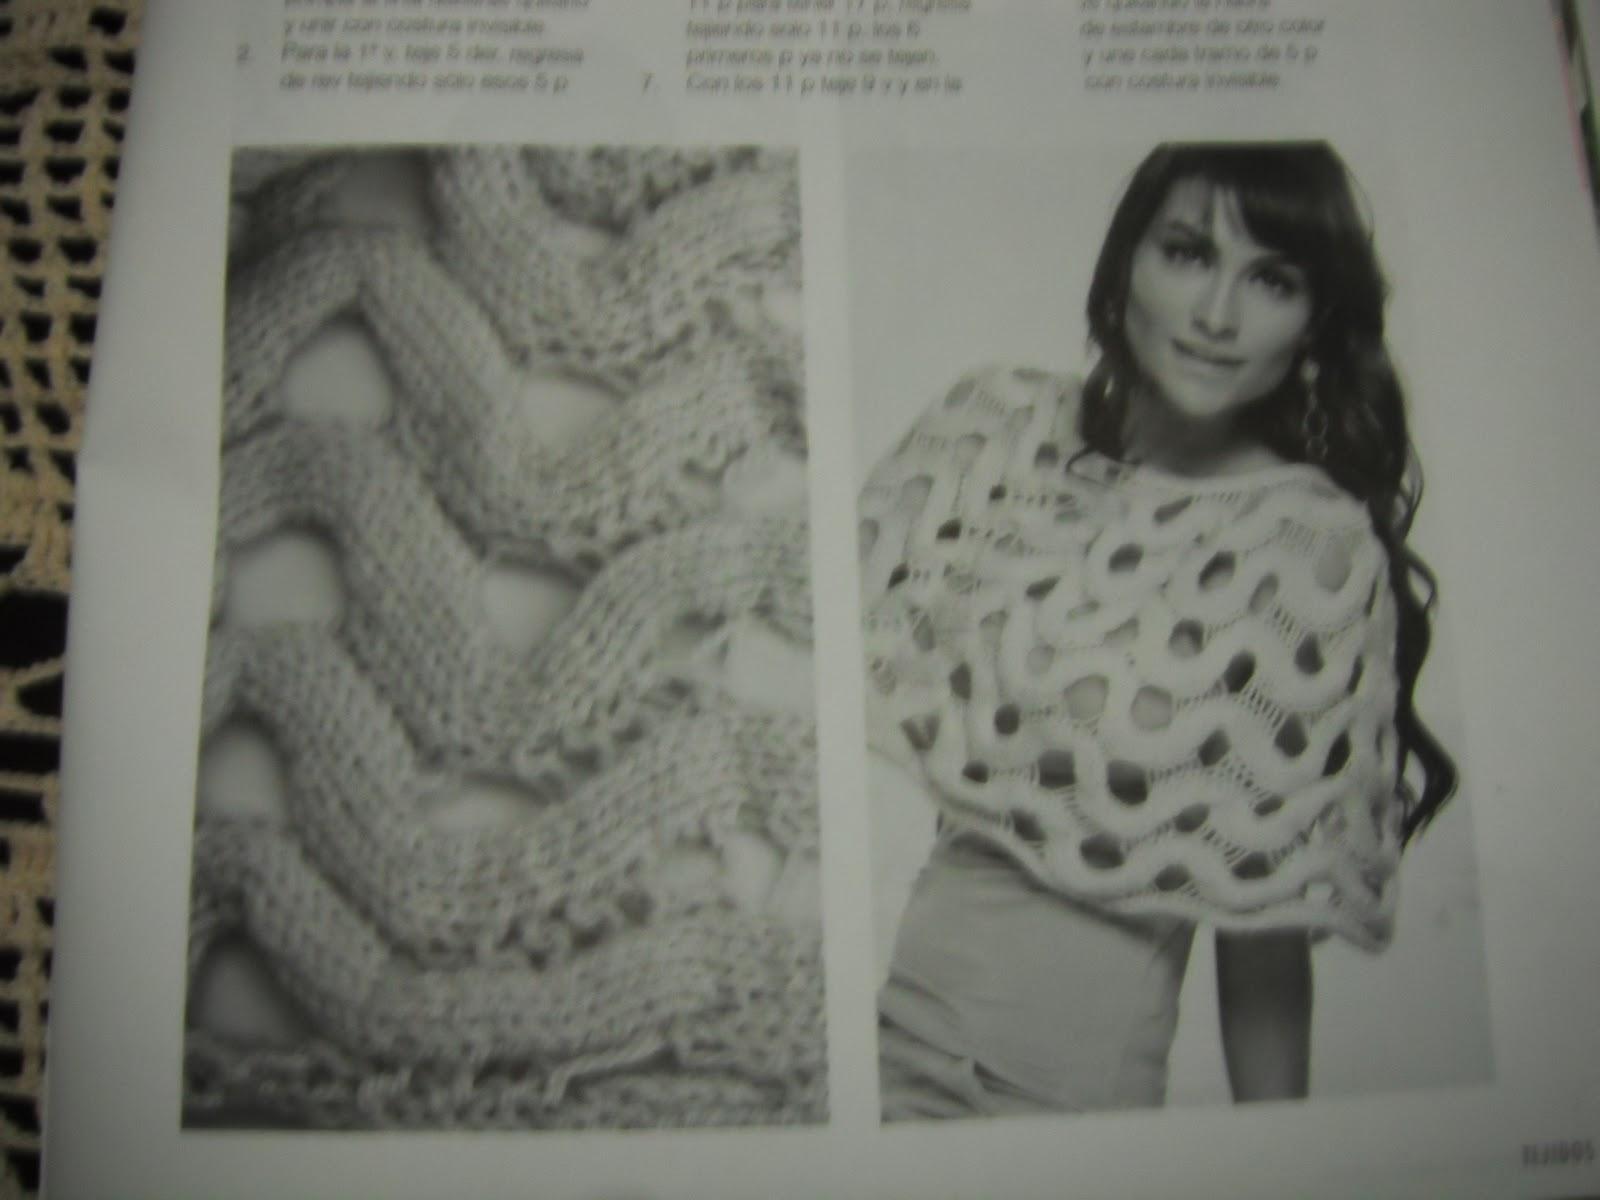 Capa de ondas. Knitting. Aran. Cables.